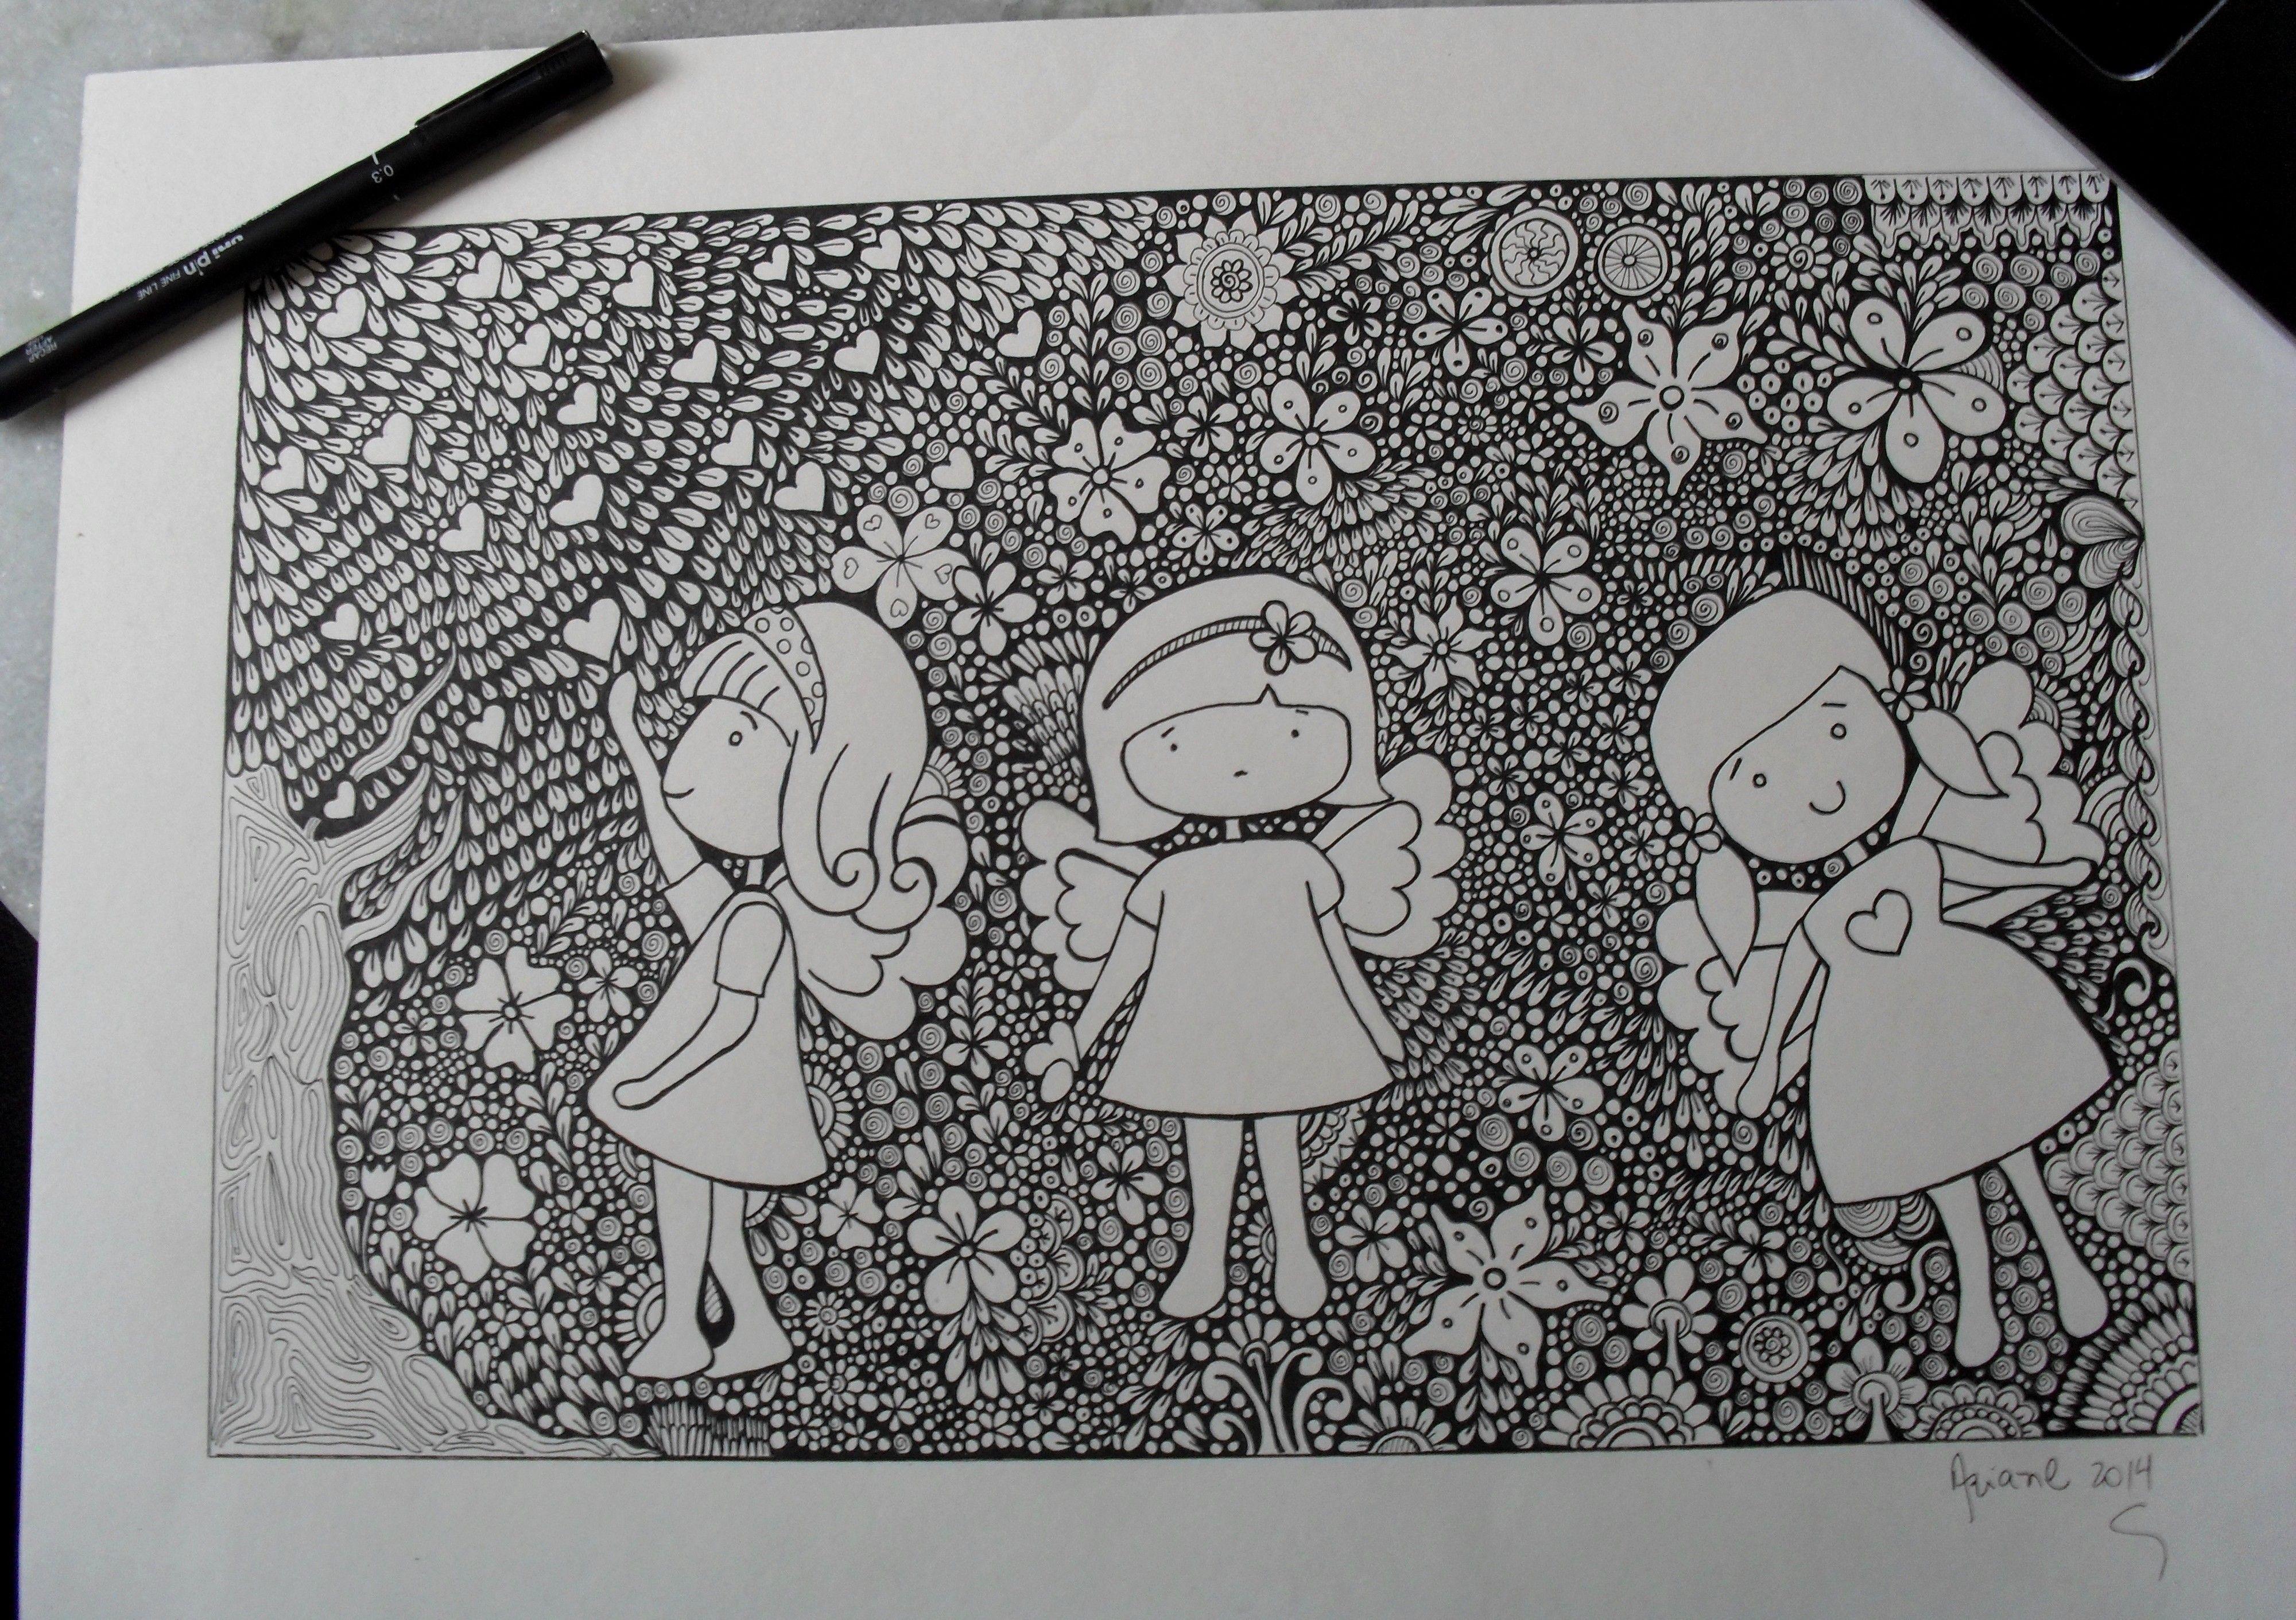 #Doodle #DoodleArt #Zentangle